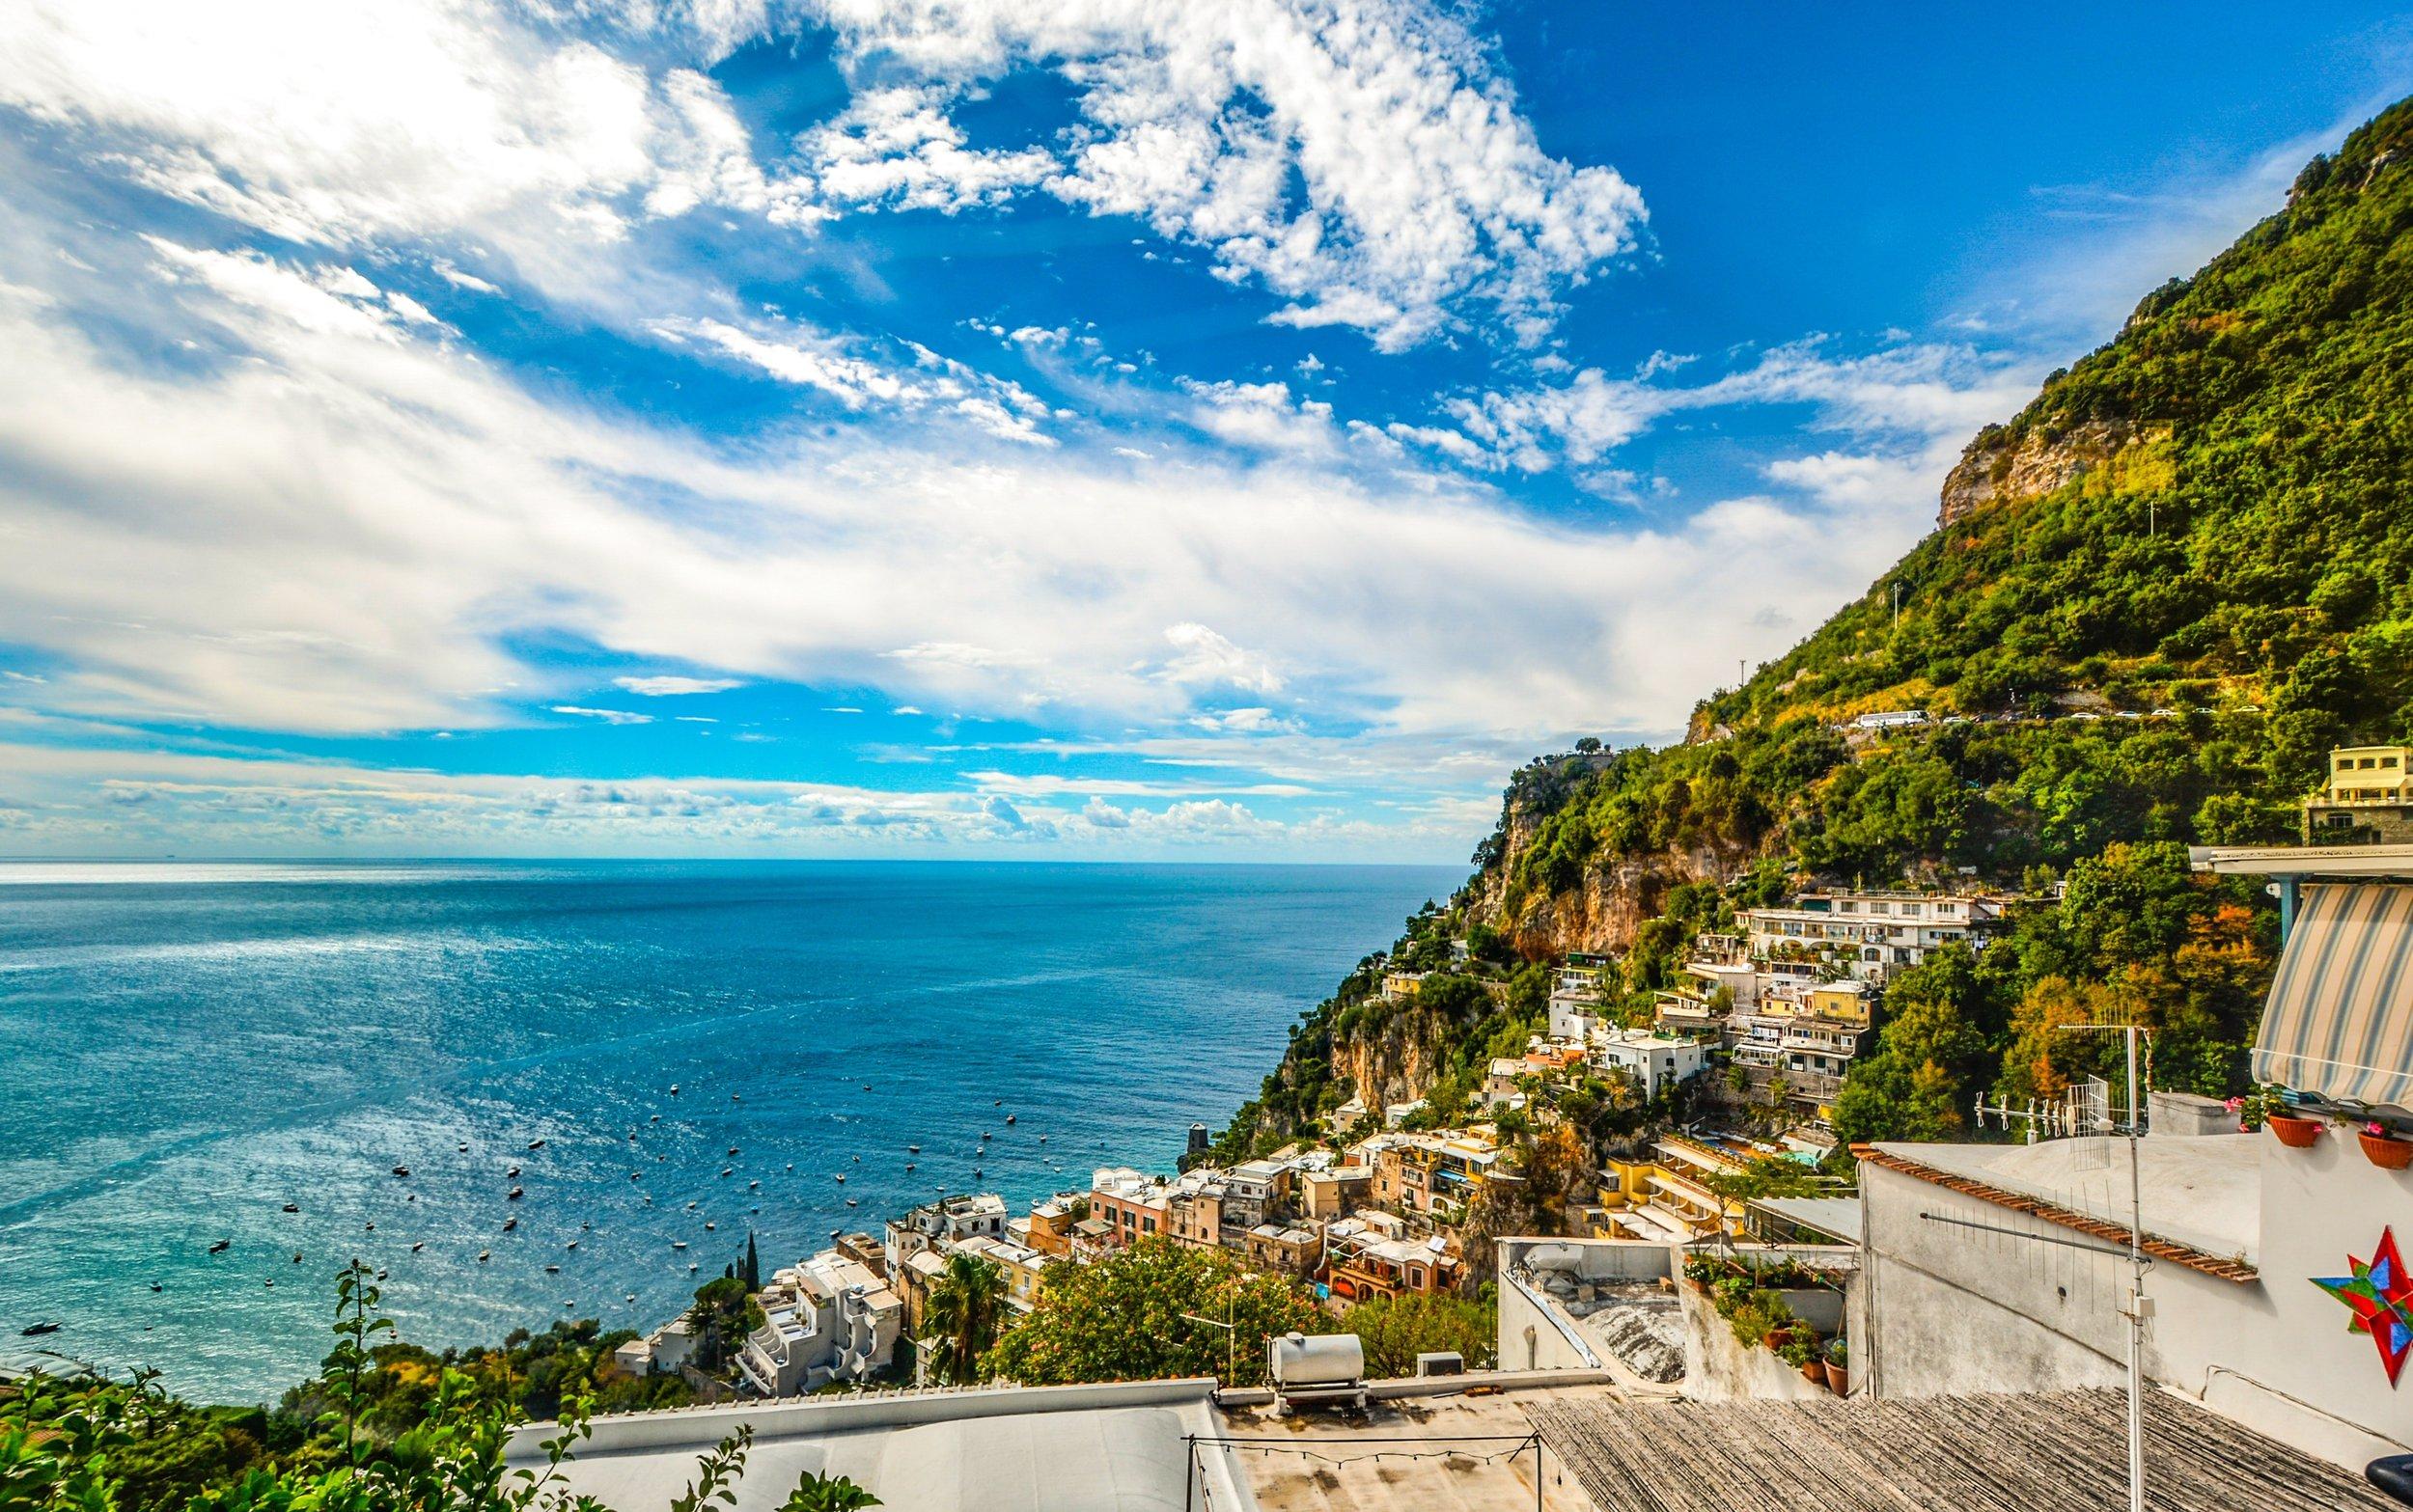 amalfi-amalfi-coast-architecture-358223.jpg